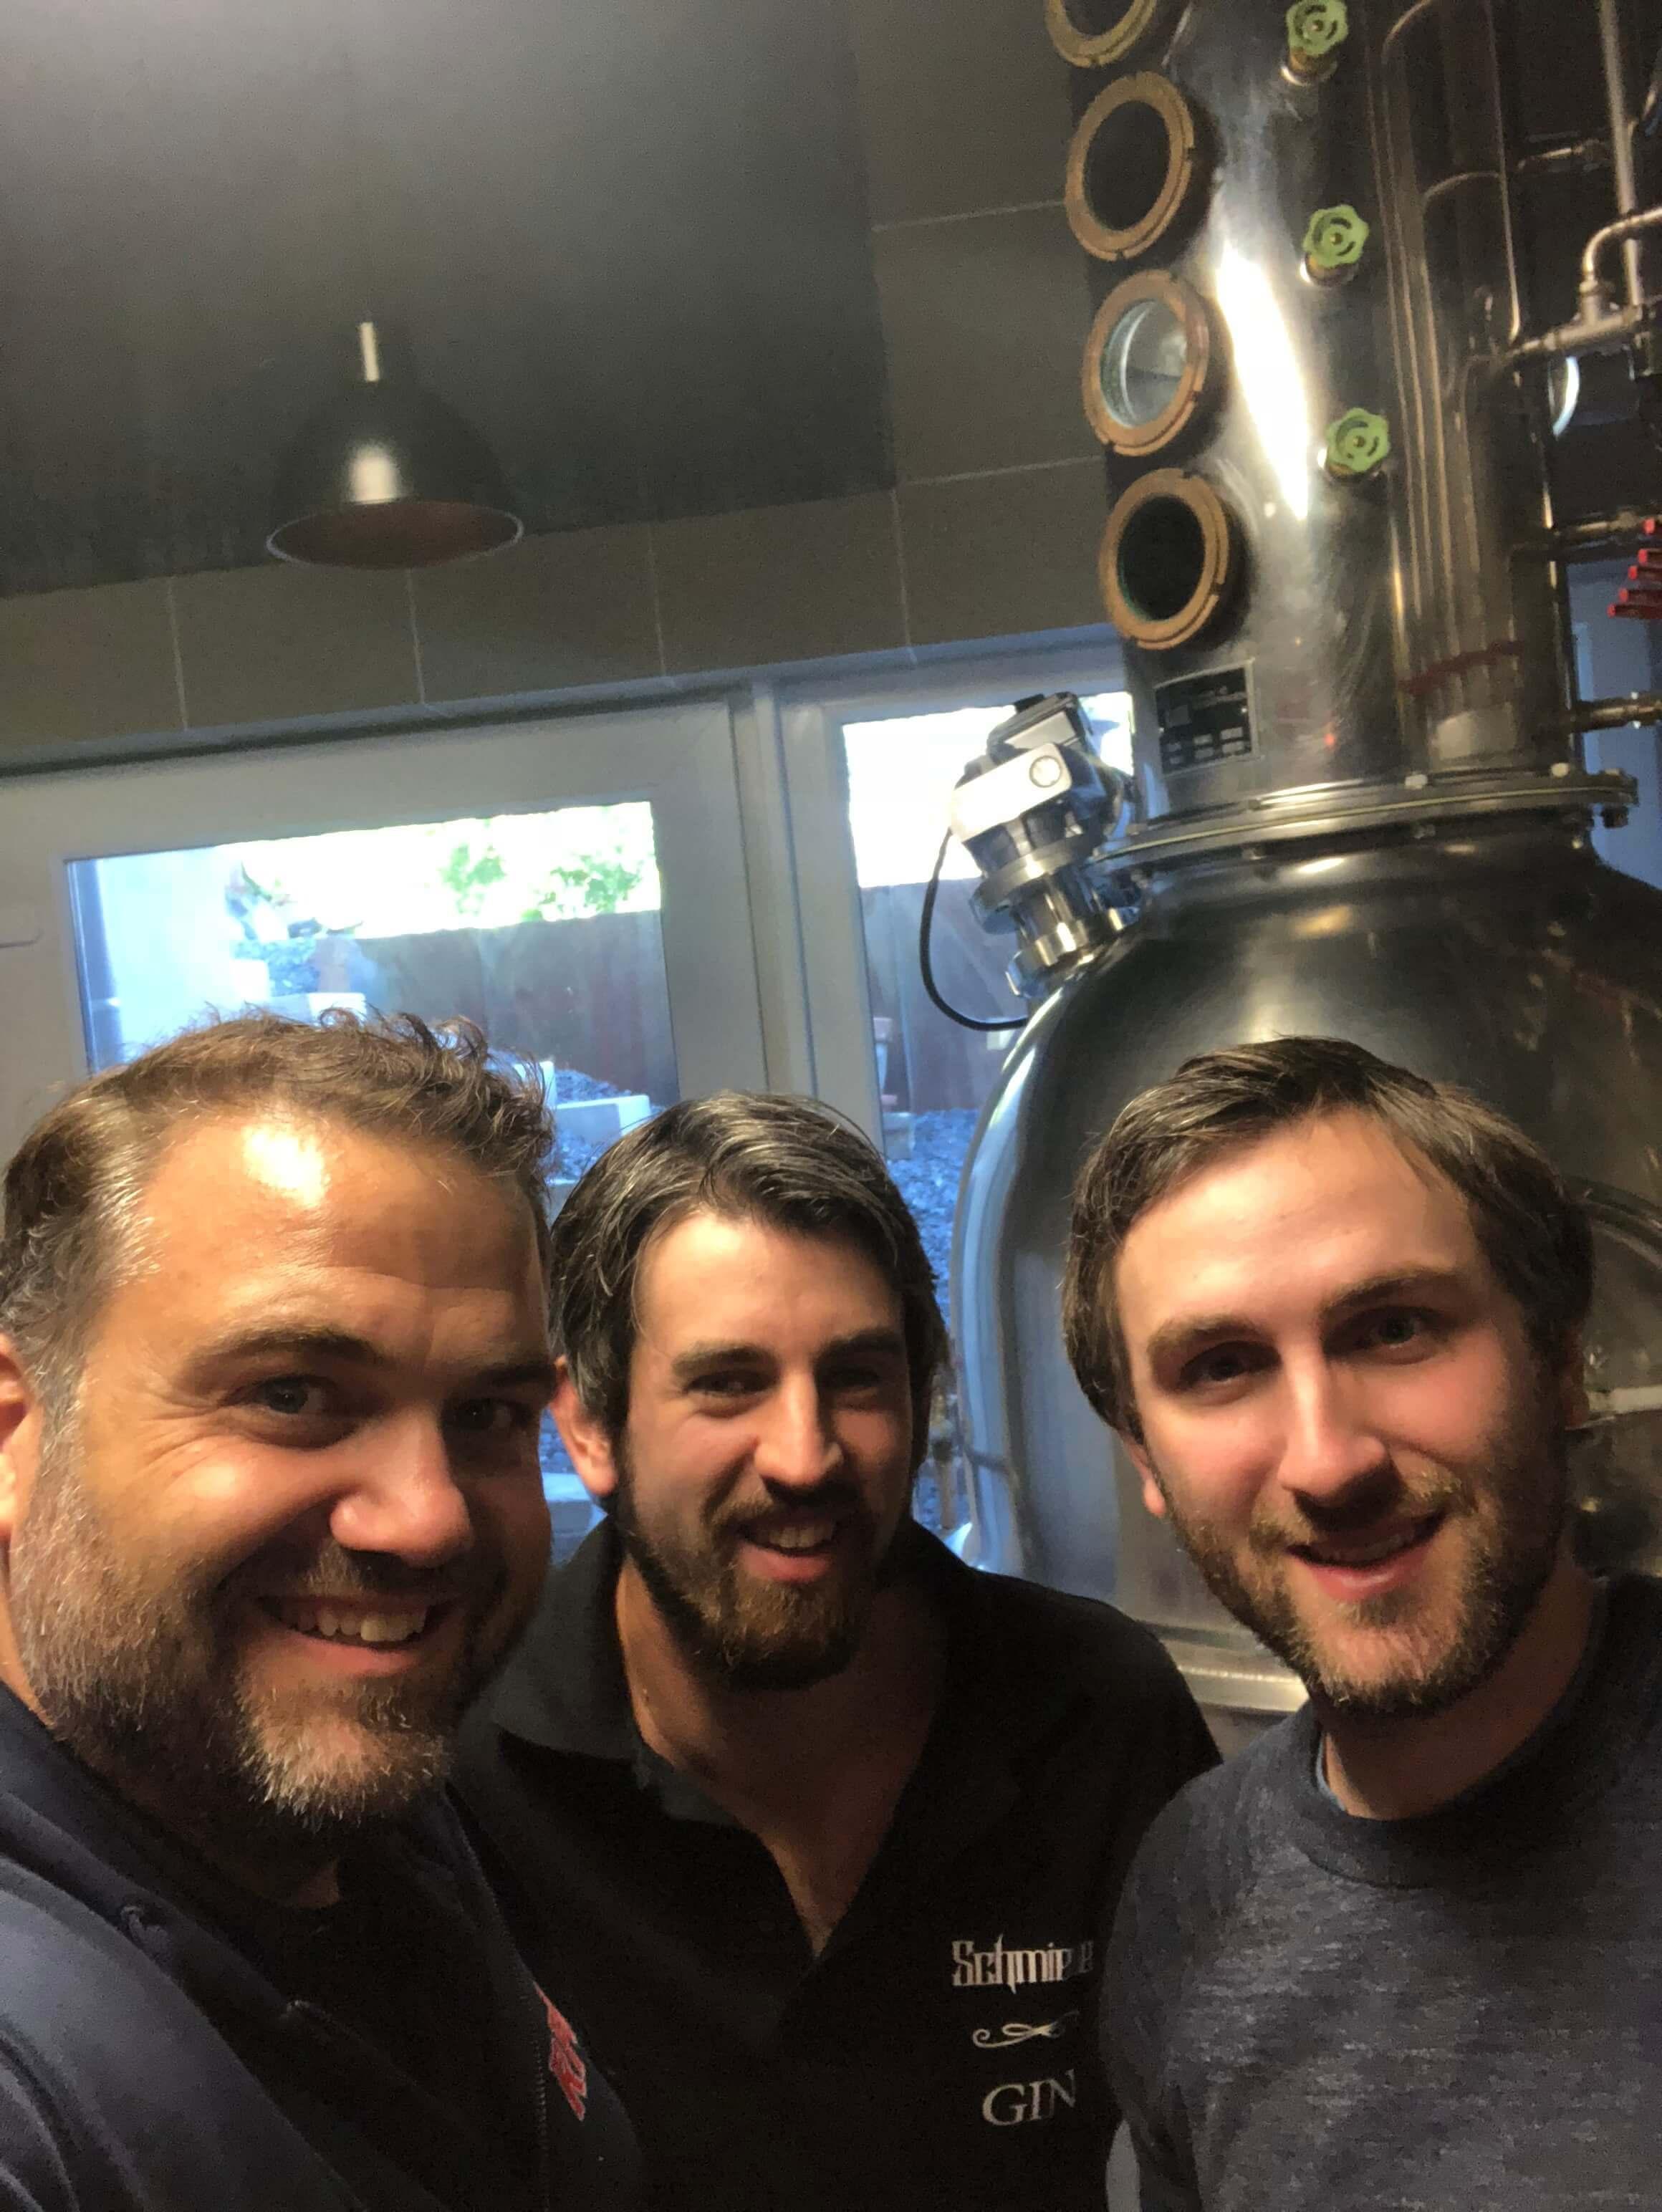 Kunze RPR1 Besuch Schmiede Gin